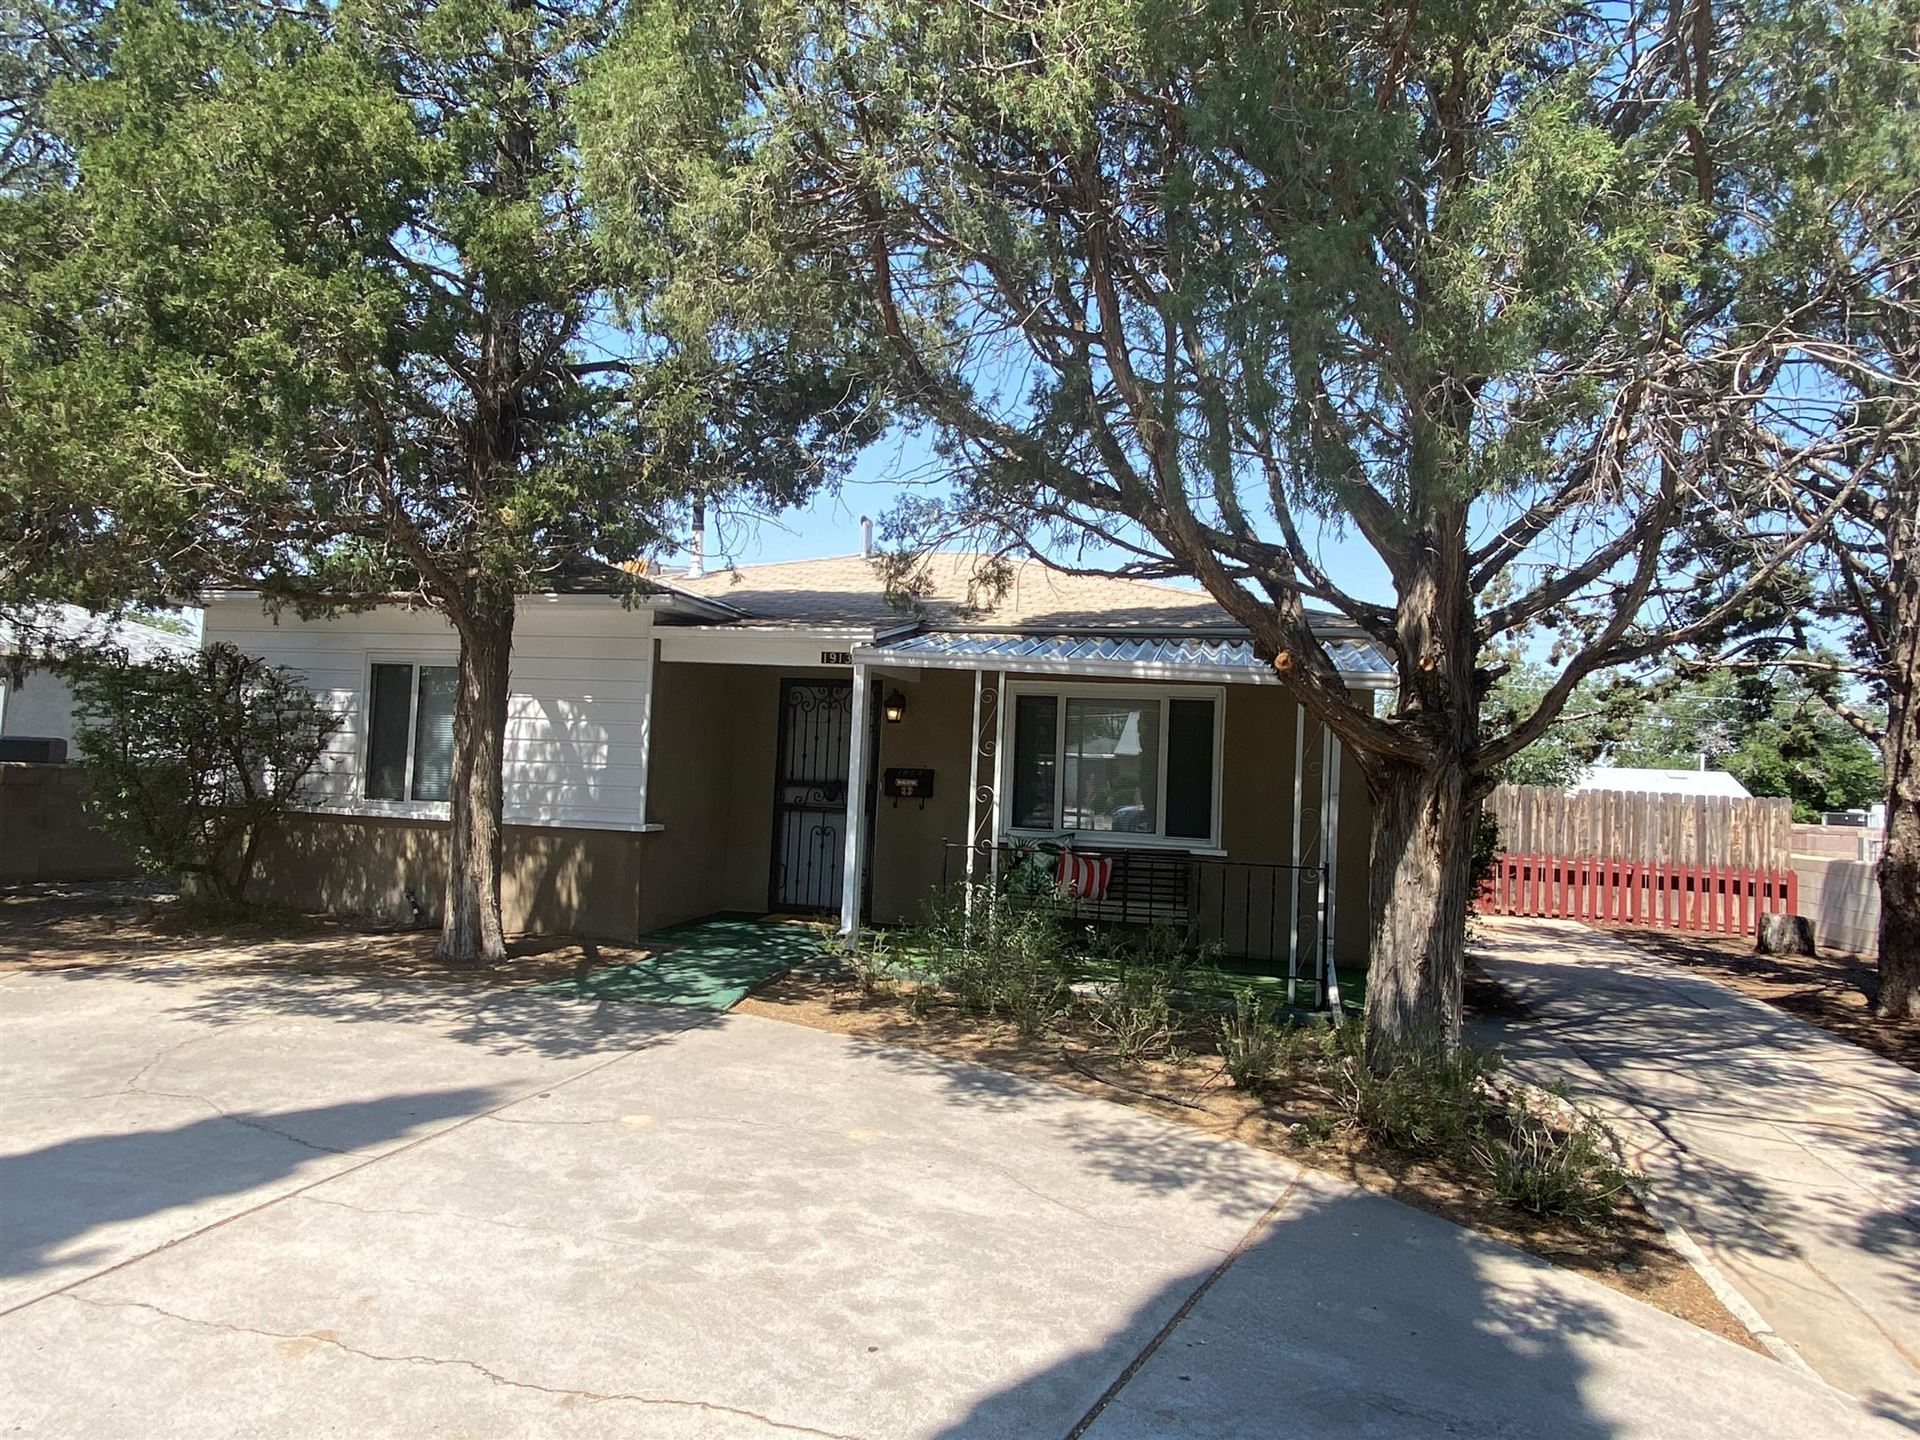 Photo of 1913 PALOMAS Drive NE, Albuquerque, NM 87110 (MLS # 994559)